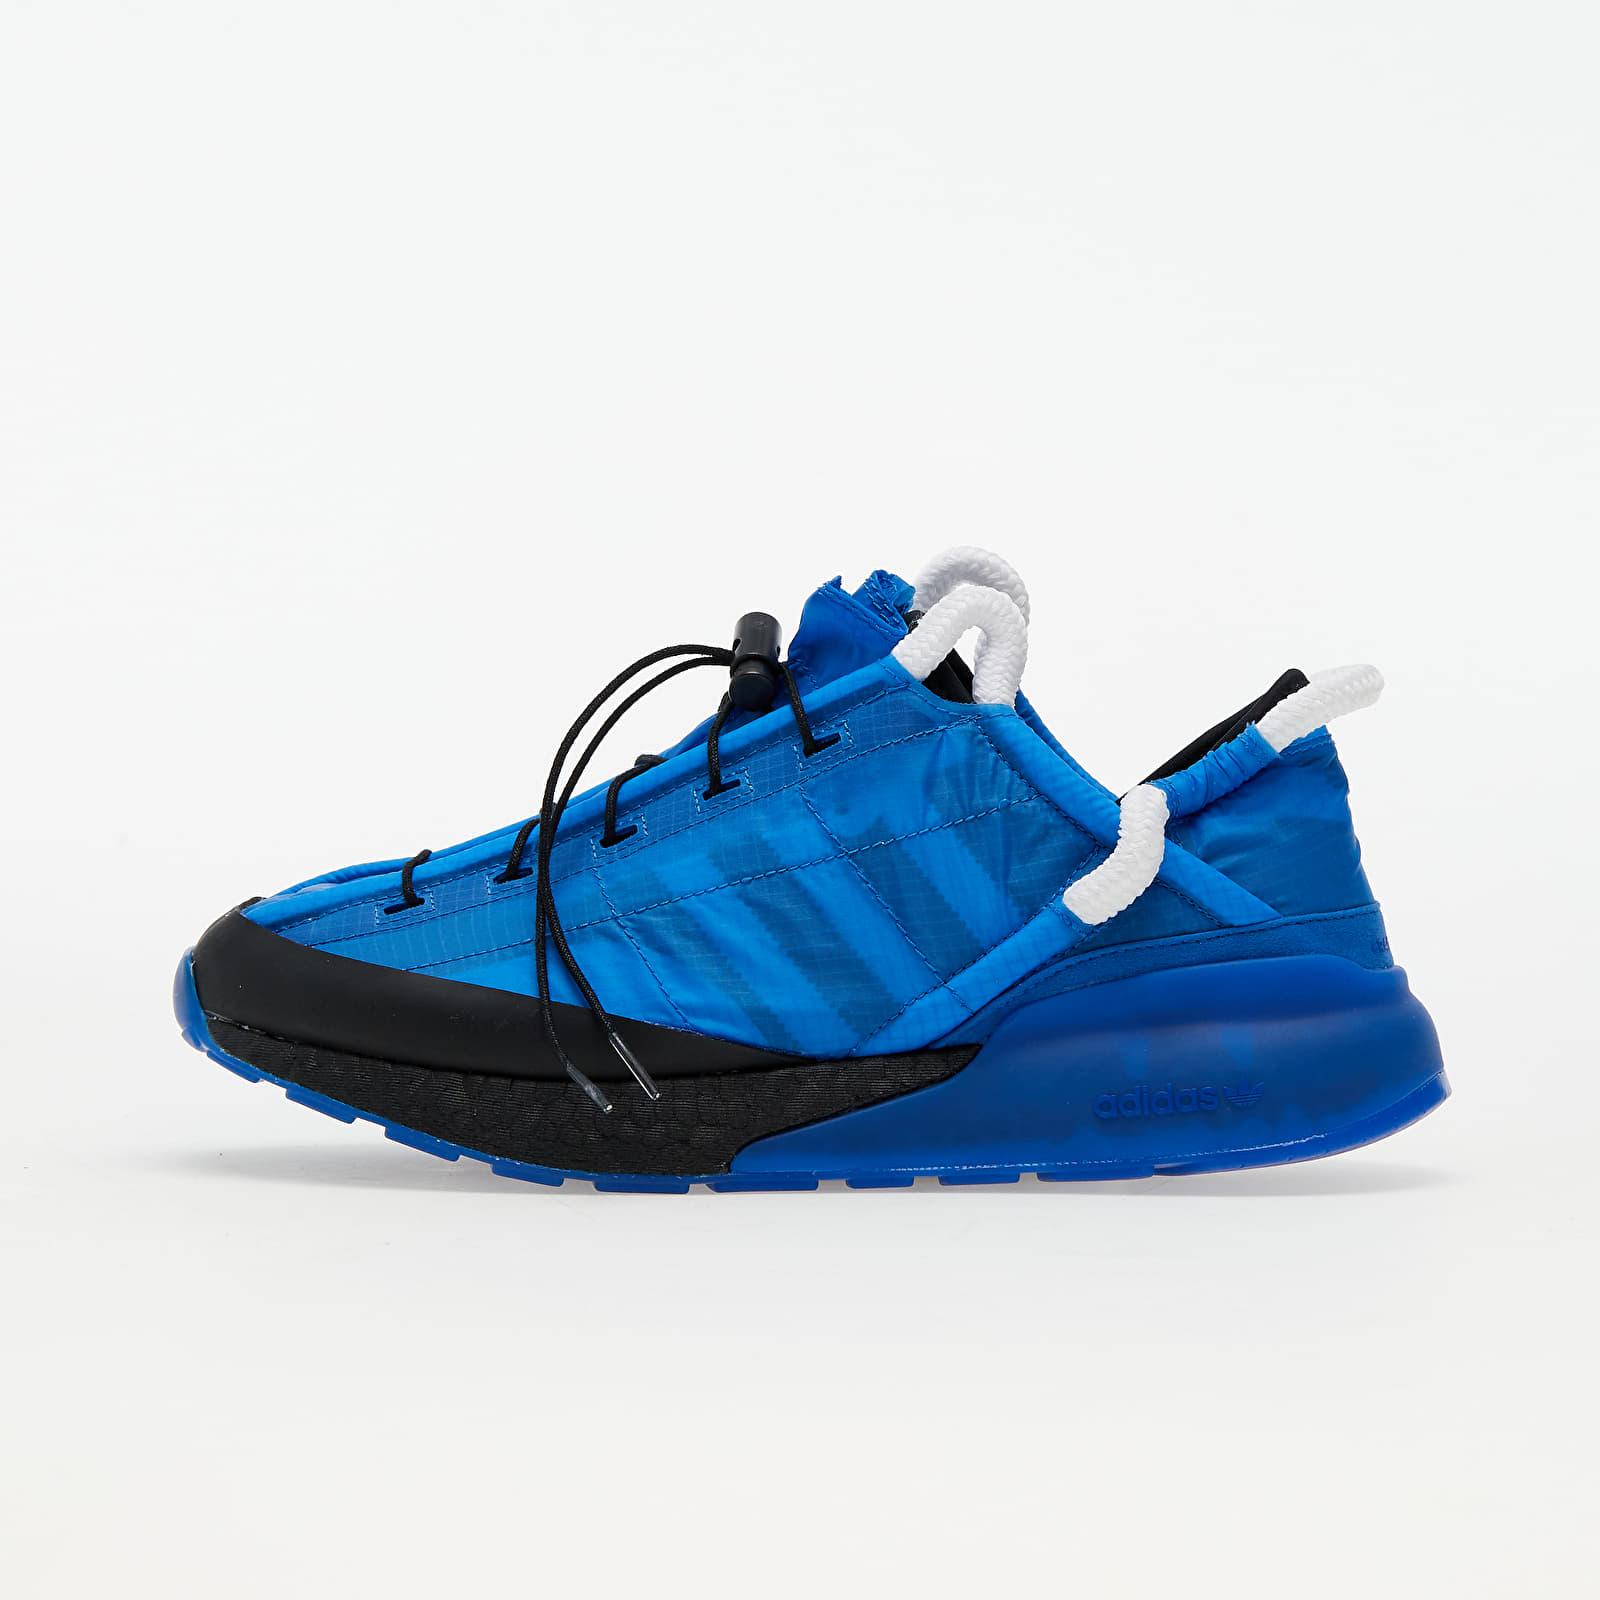 adidas x Craig Green Zx 2K Phormar Blue/ Core White/ Core Black EUR 42